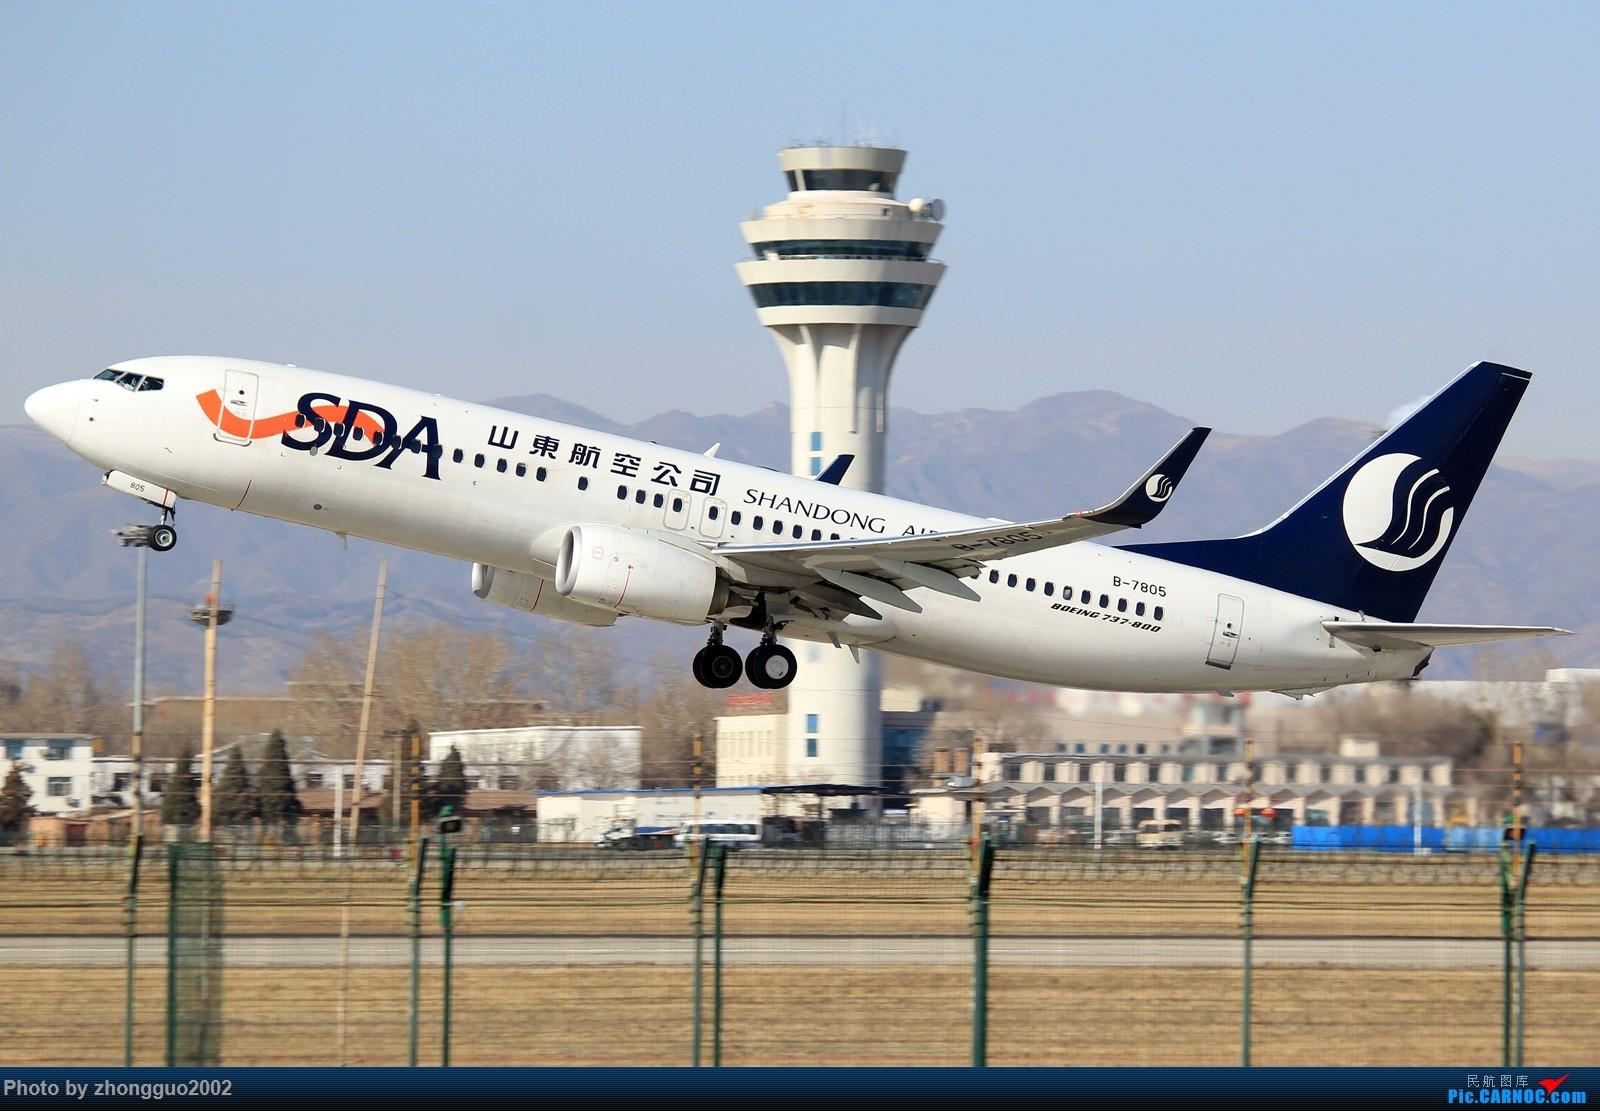 Re:[原创]久违---呼和浩特 BOEING 737-800 B-7805 中国呼和浩特白塔国际机场